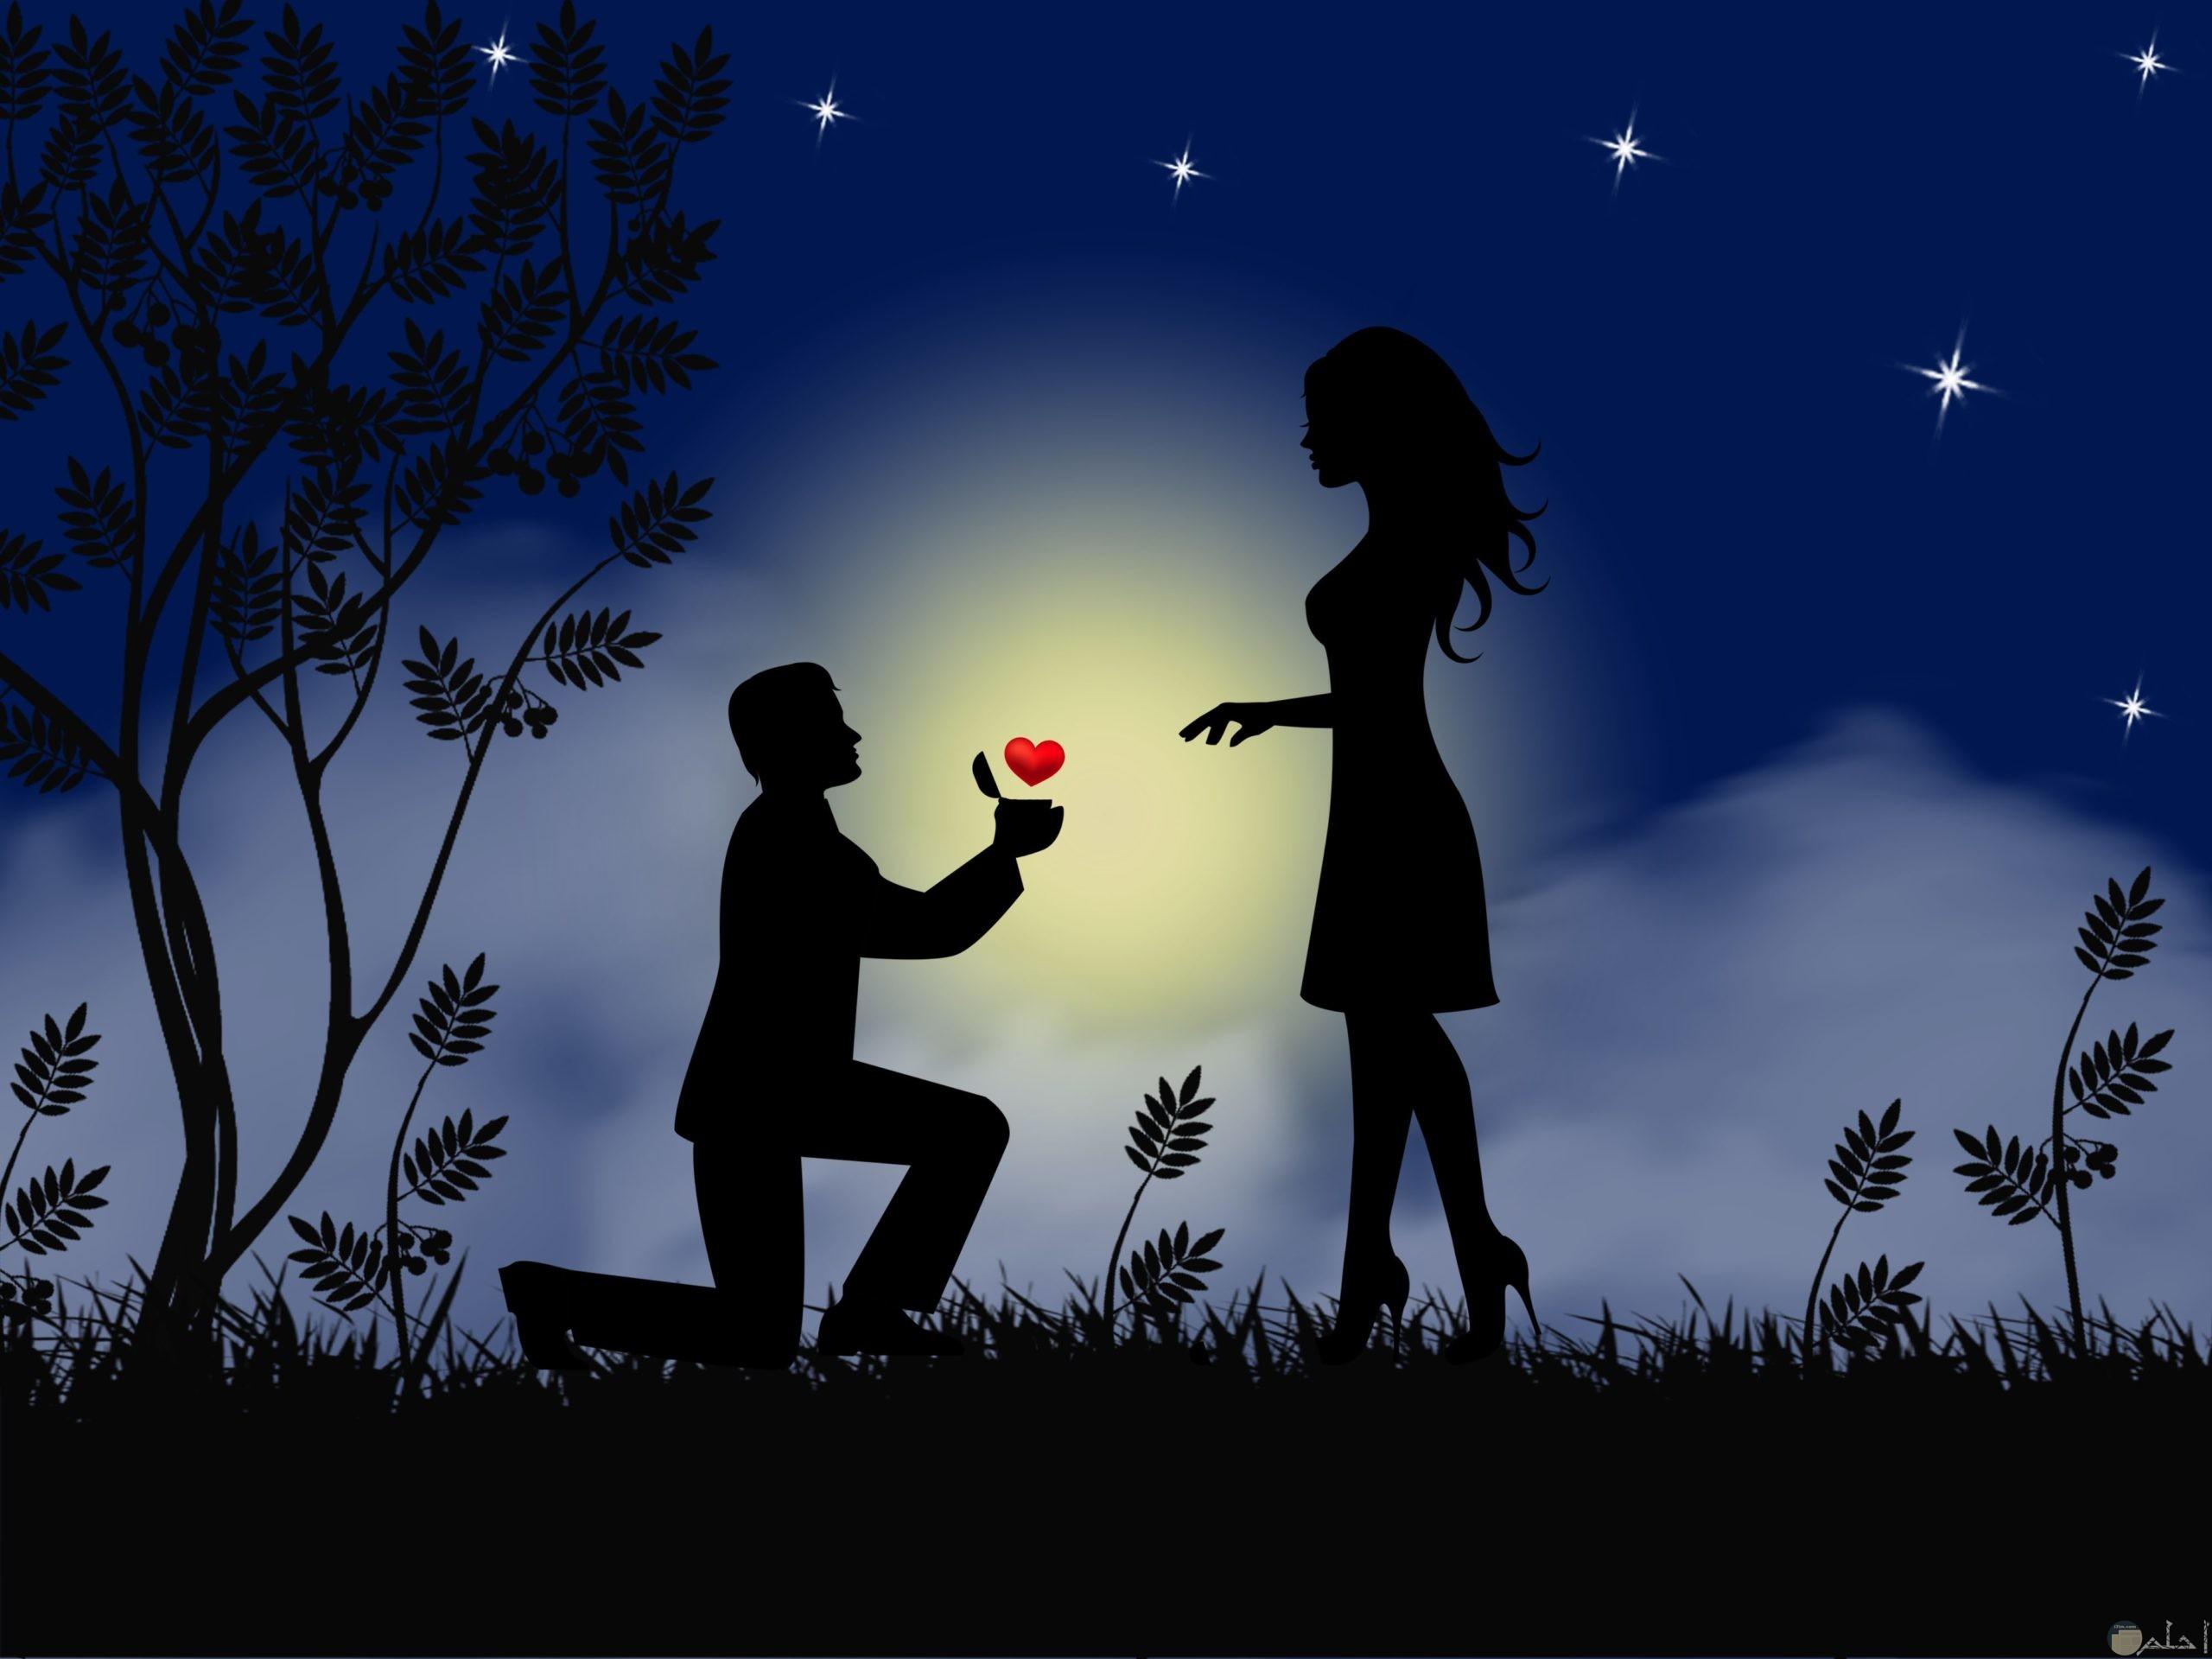 رسمة لبنت و ولد يعطيها قلب Romantic Couple